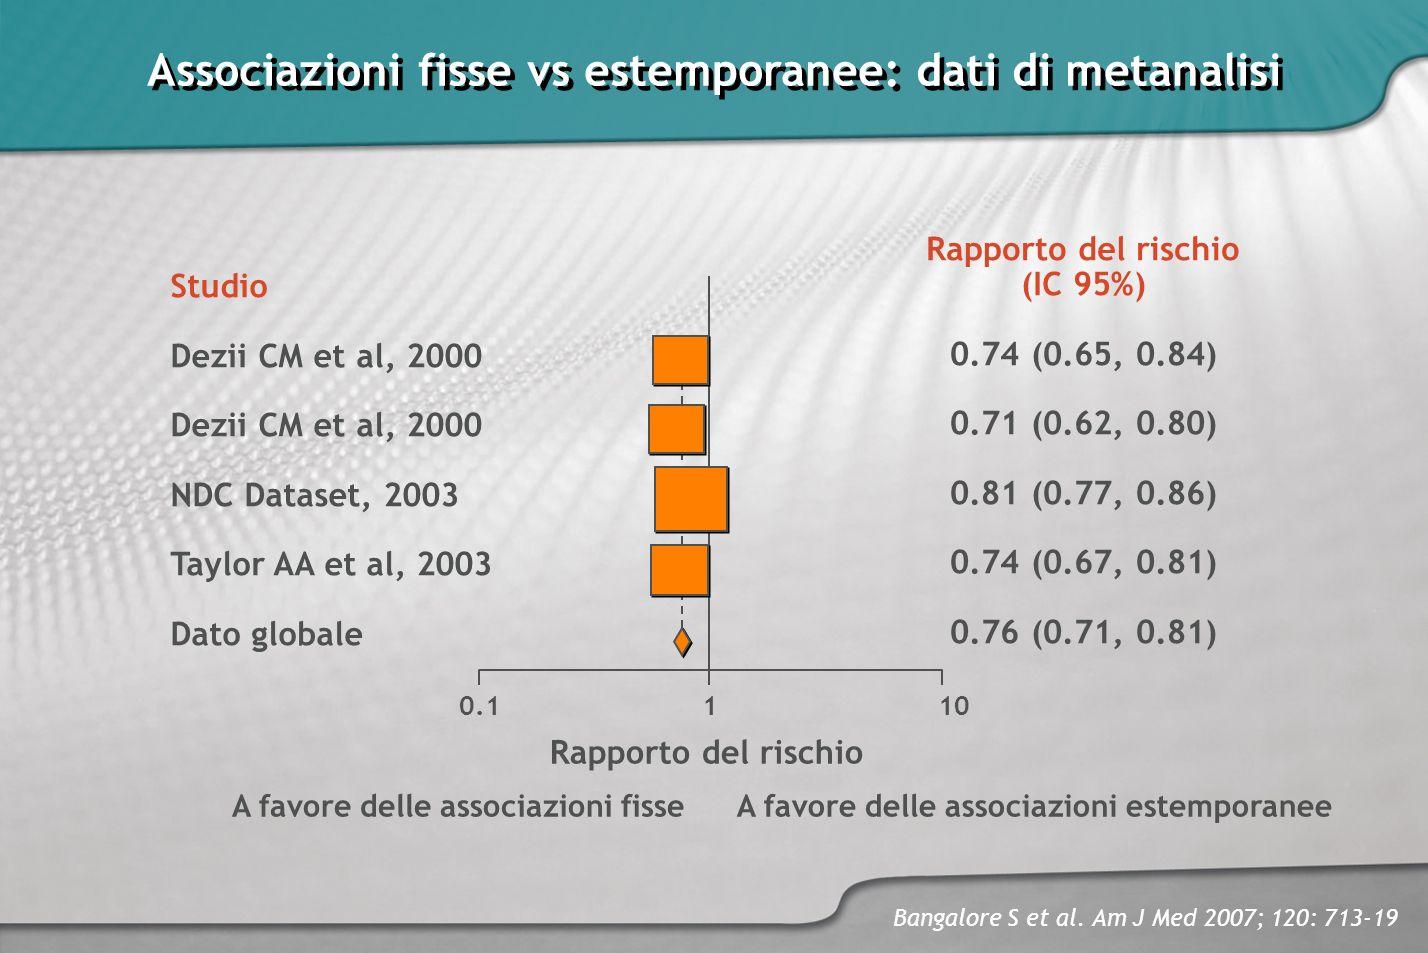 Associazioni fisse vs estemporanee: dati di metanalisi